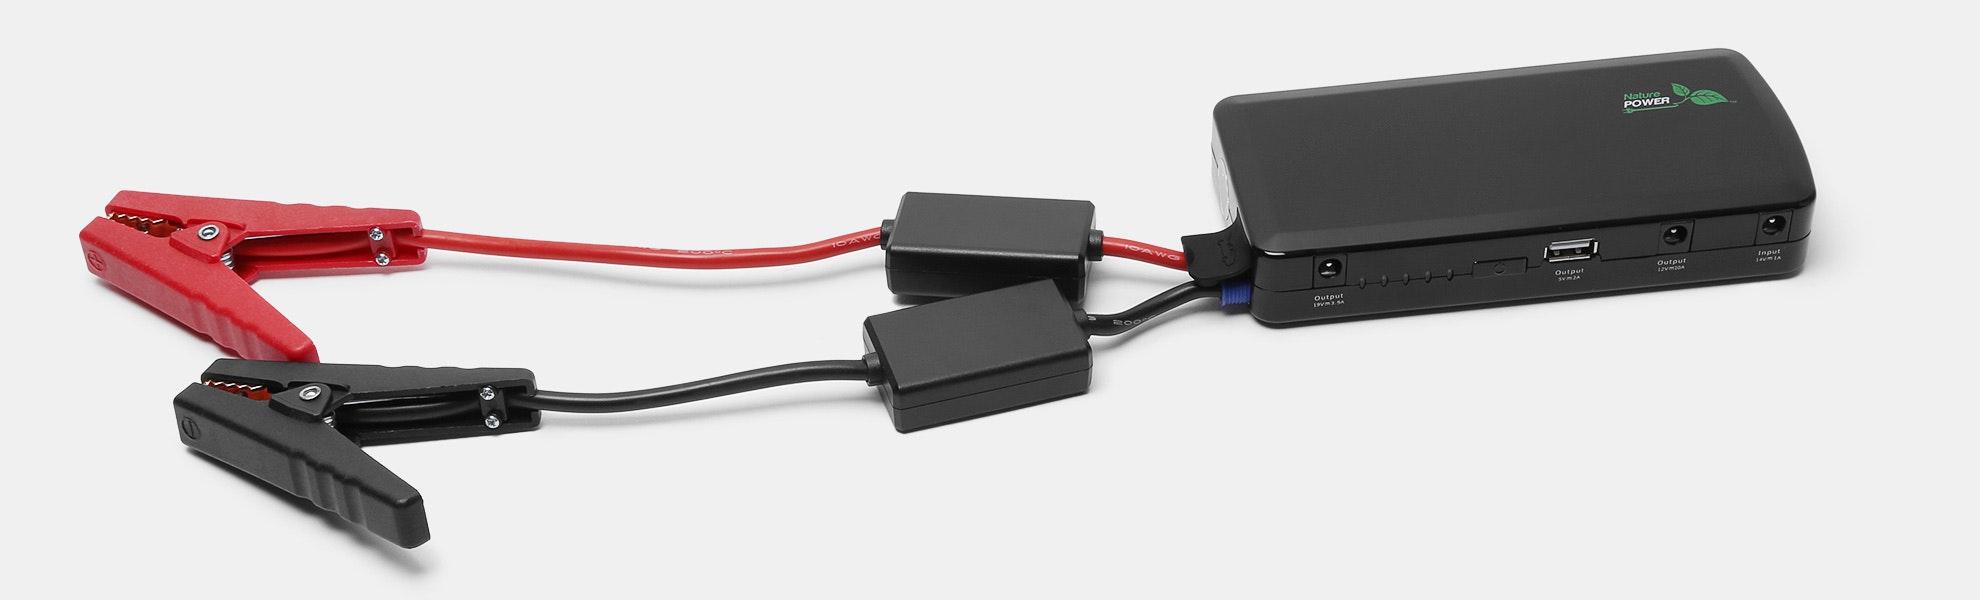 Nature Power Jump Starter & USB Charger